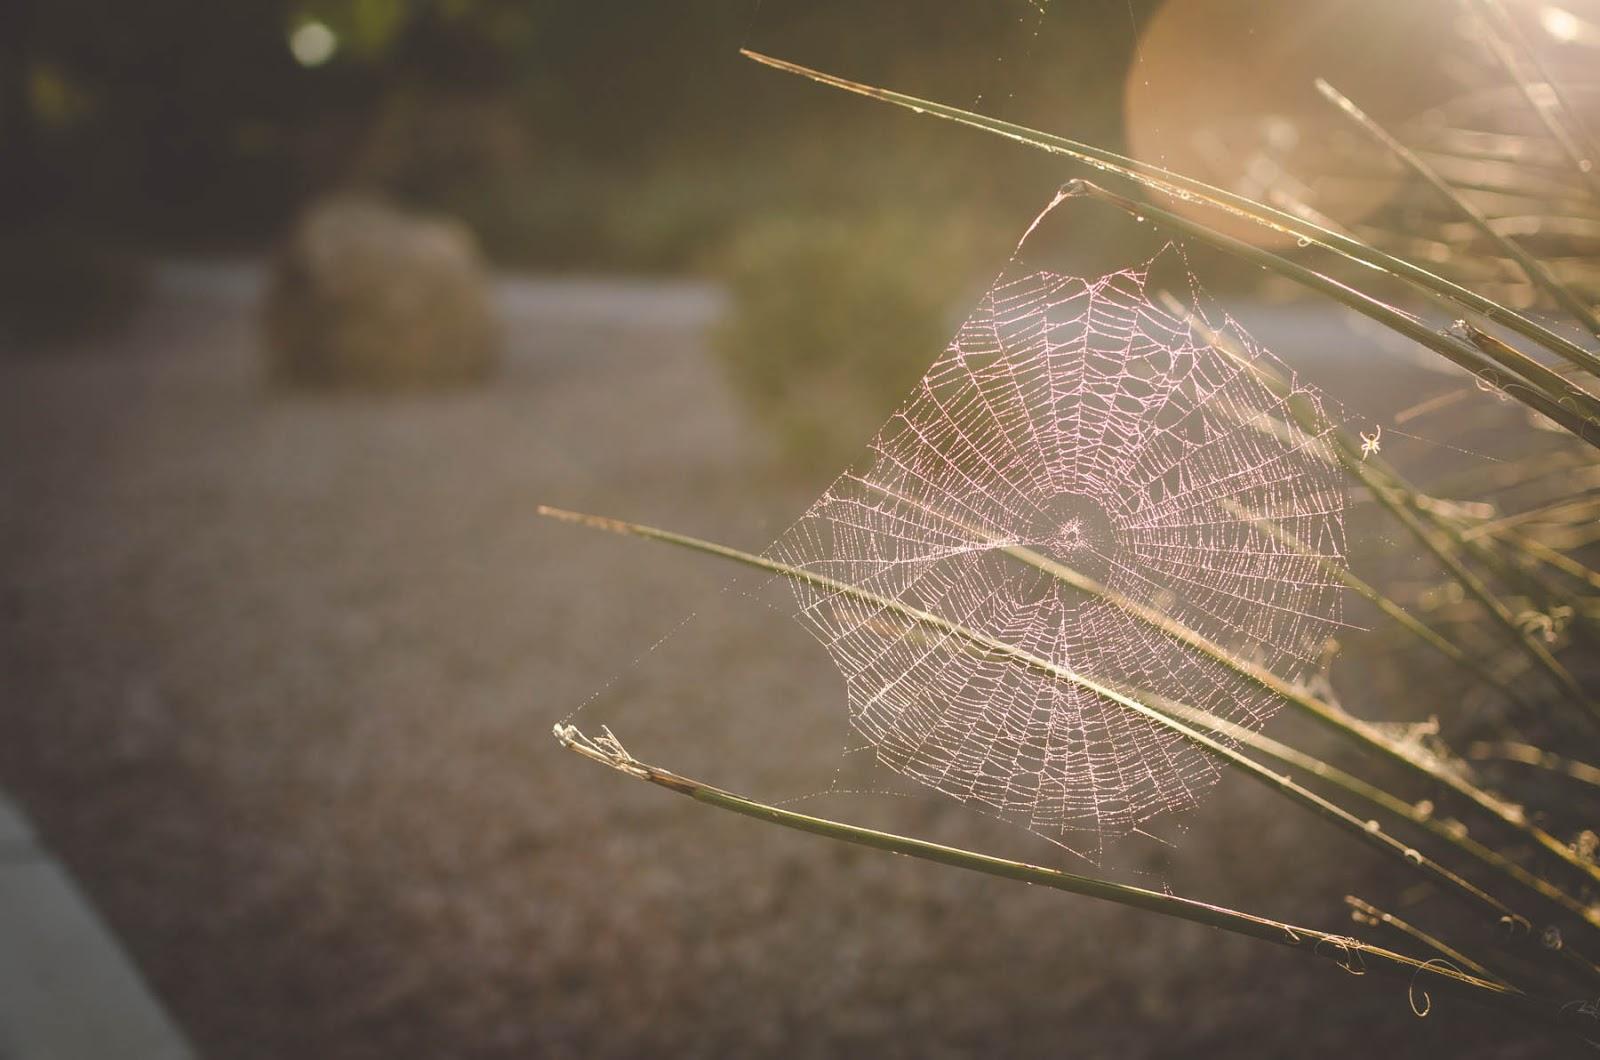 spider web images